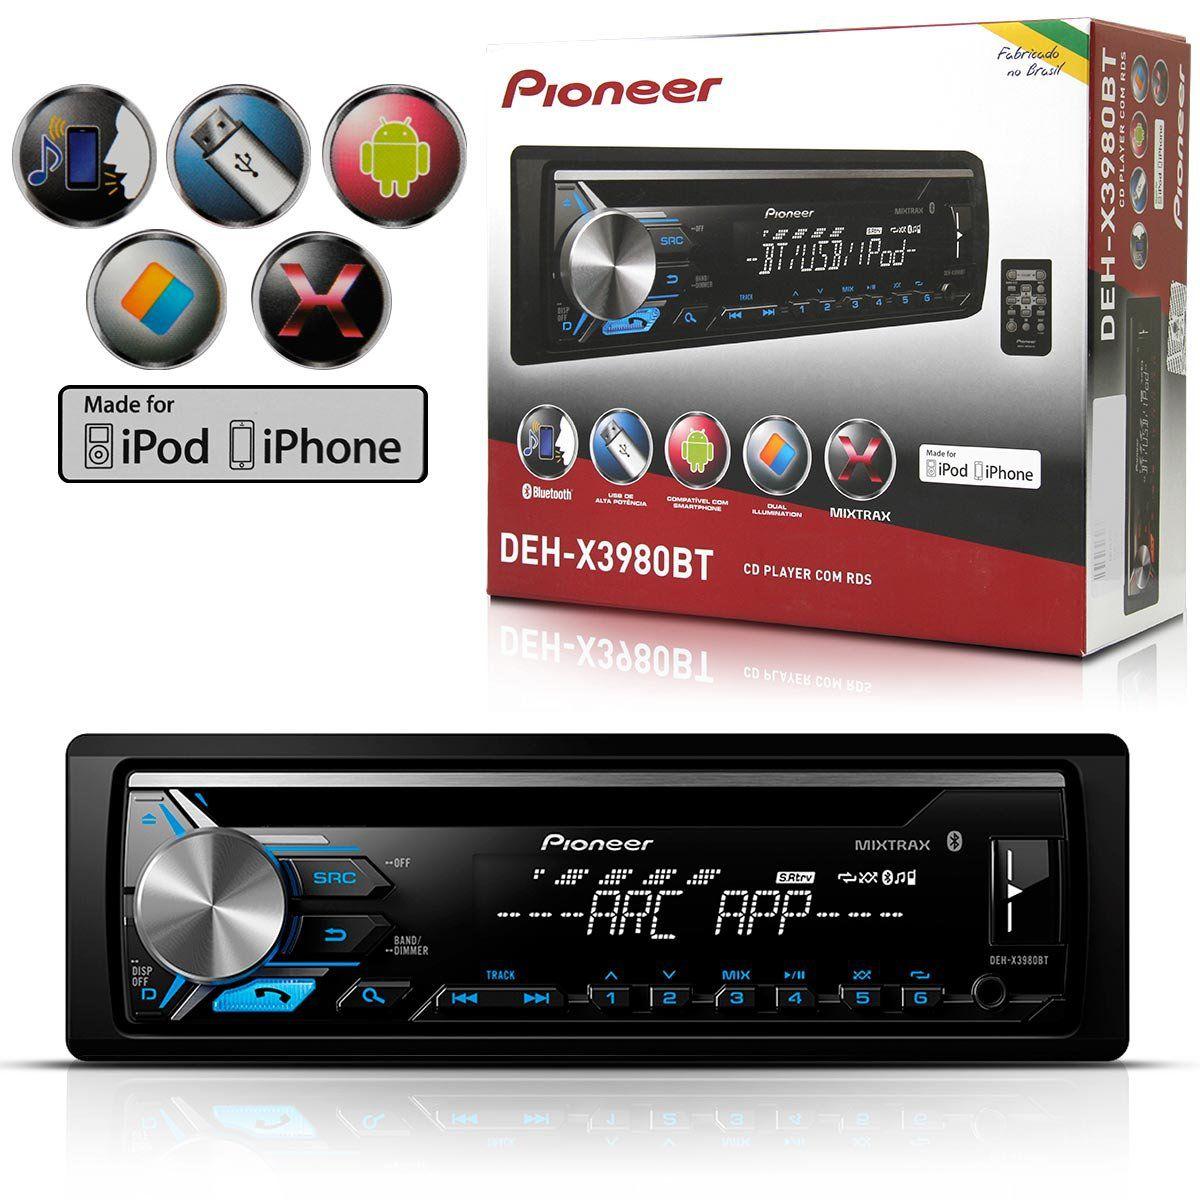 Cd Player Pioneer Deh-X3980Bt Mixtrax Usb Aux Bluetooth